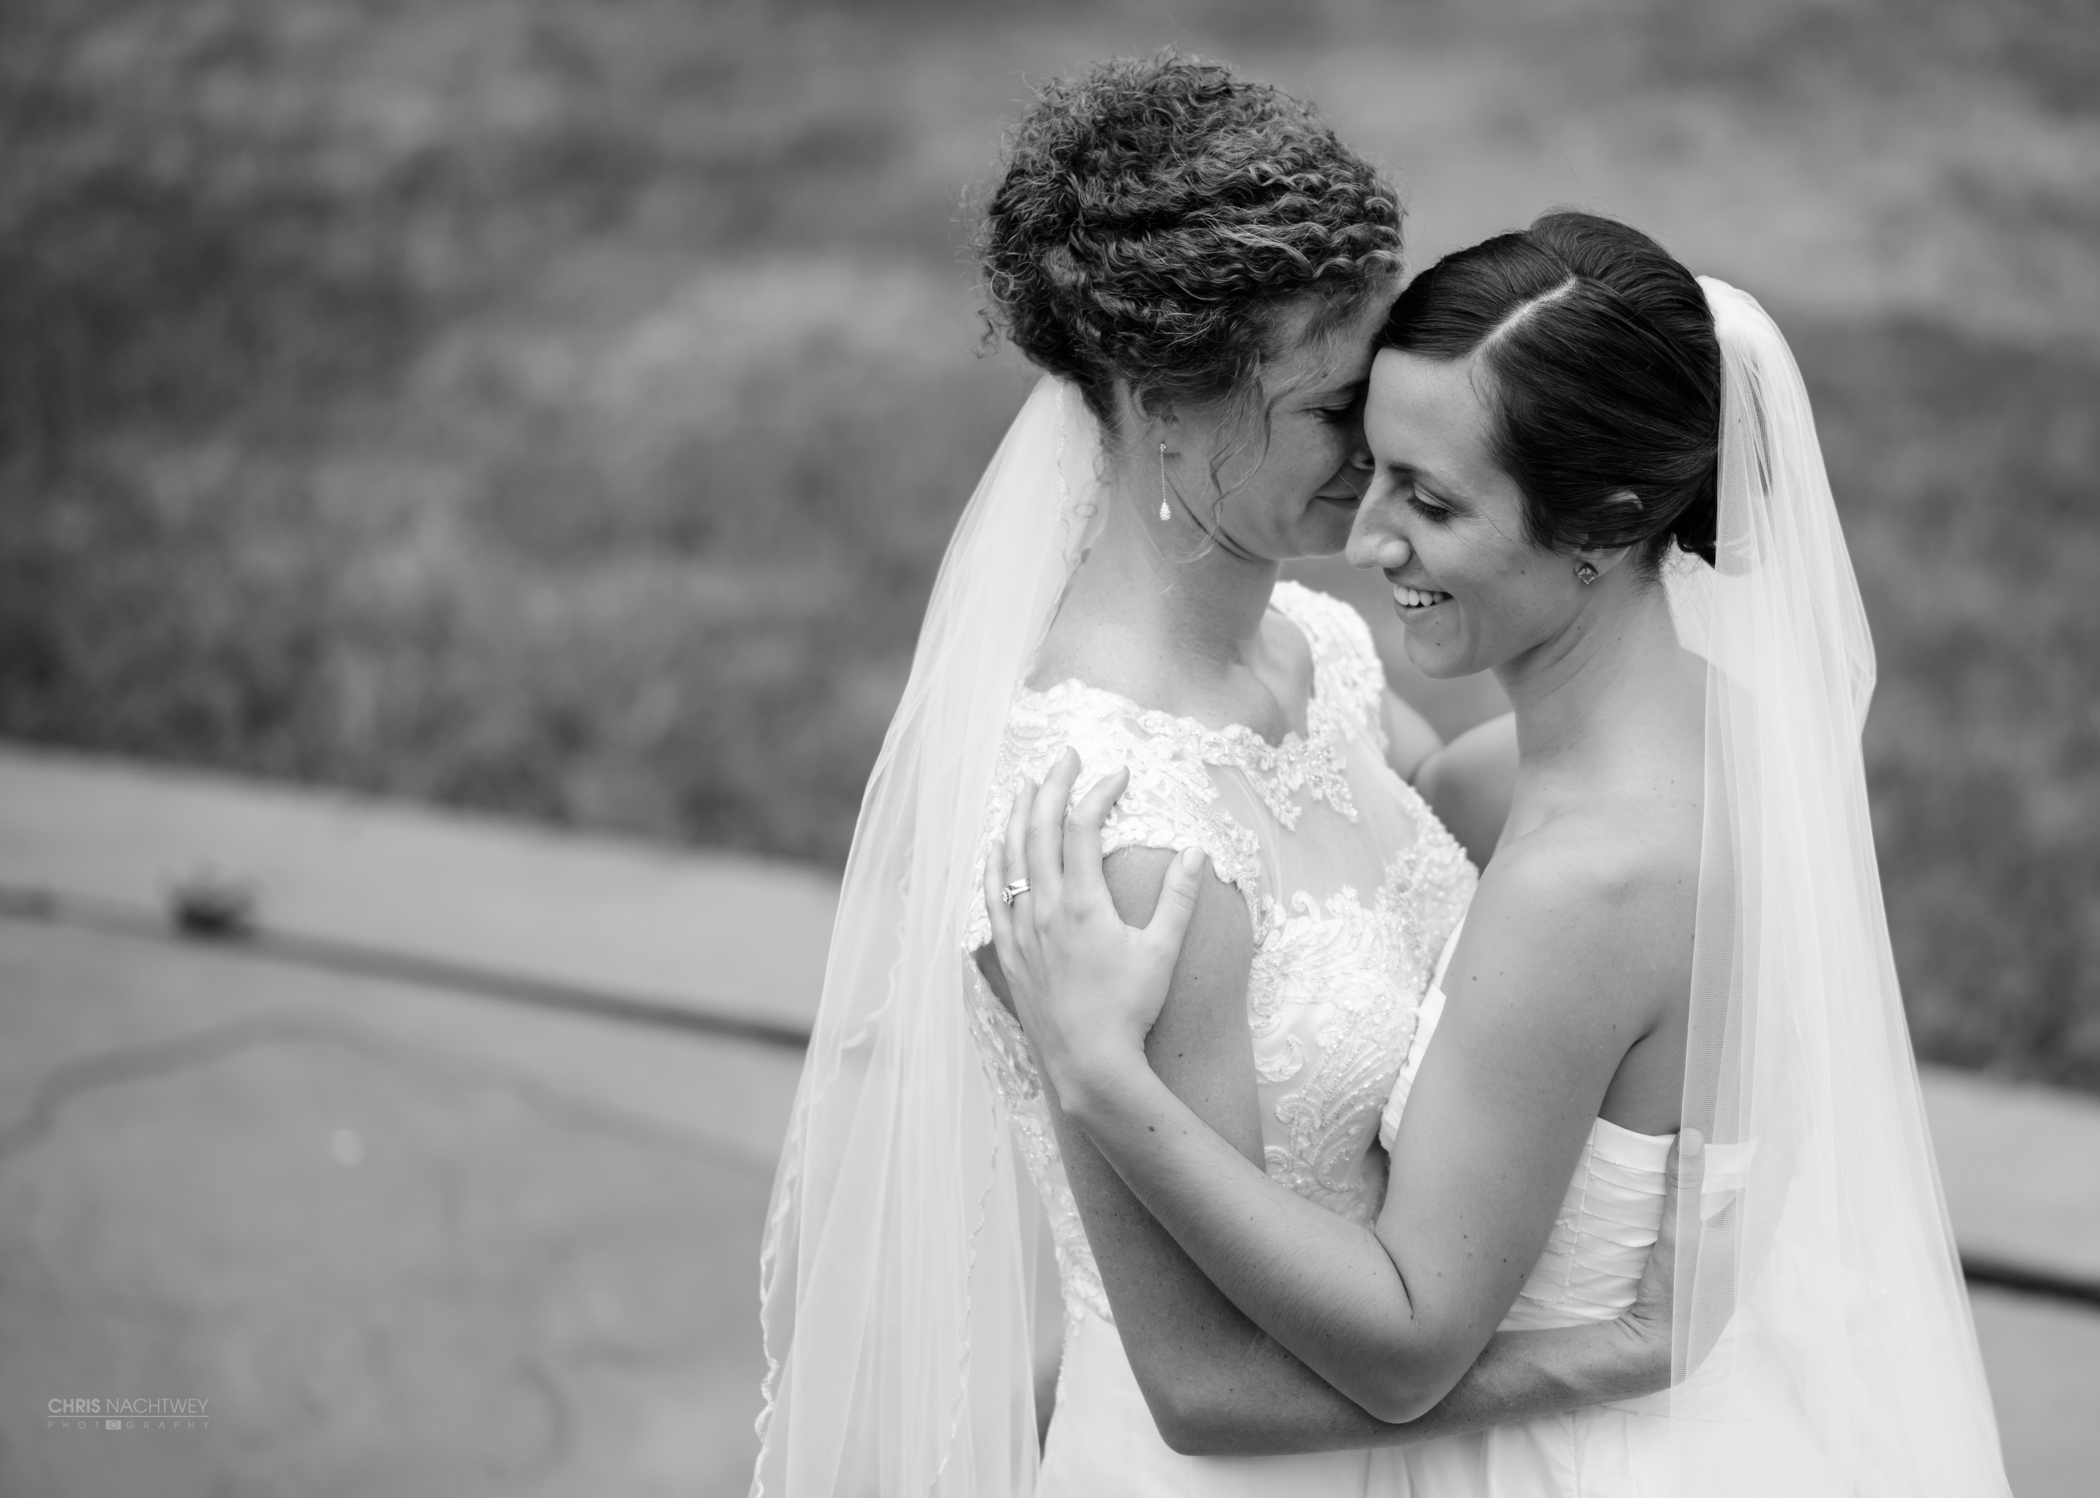 connecticut-same-sex-wedding-photographers-chris-nachtwey.jpg